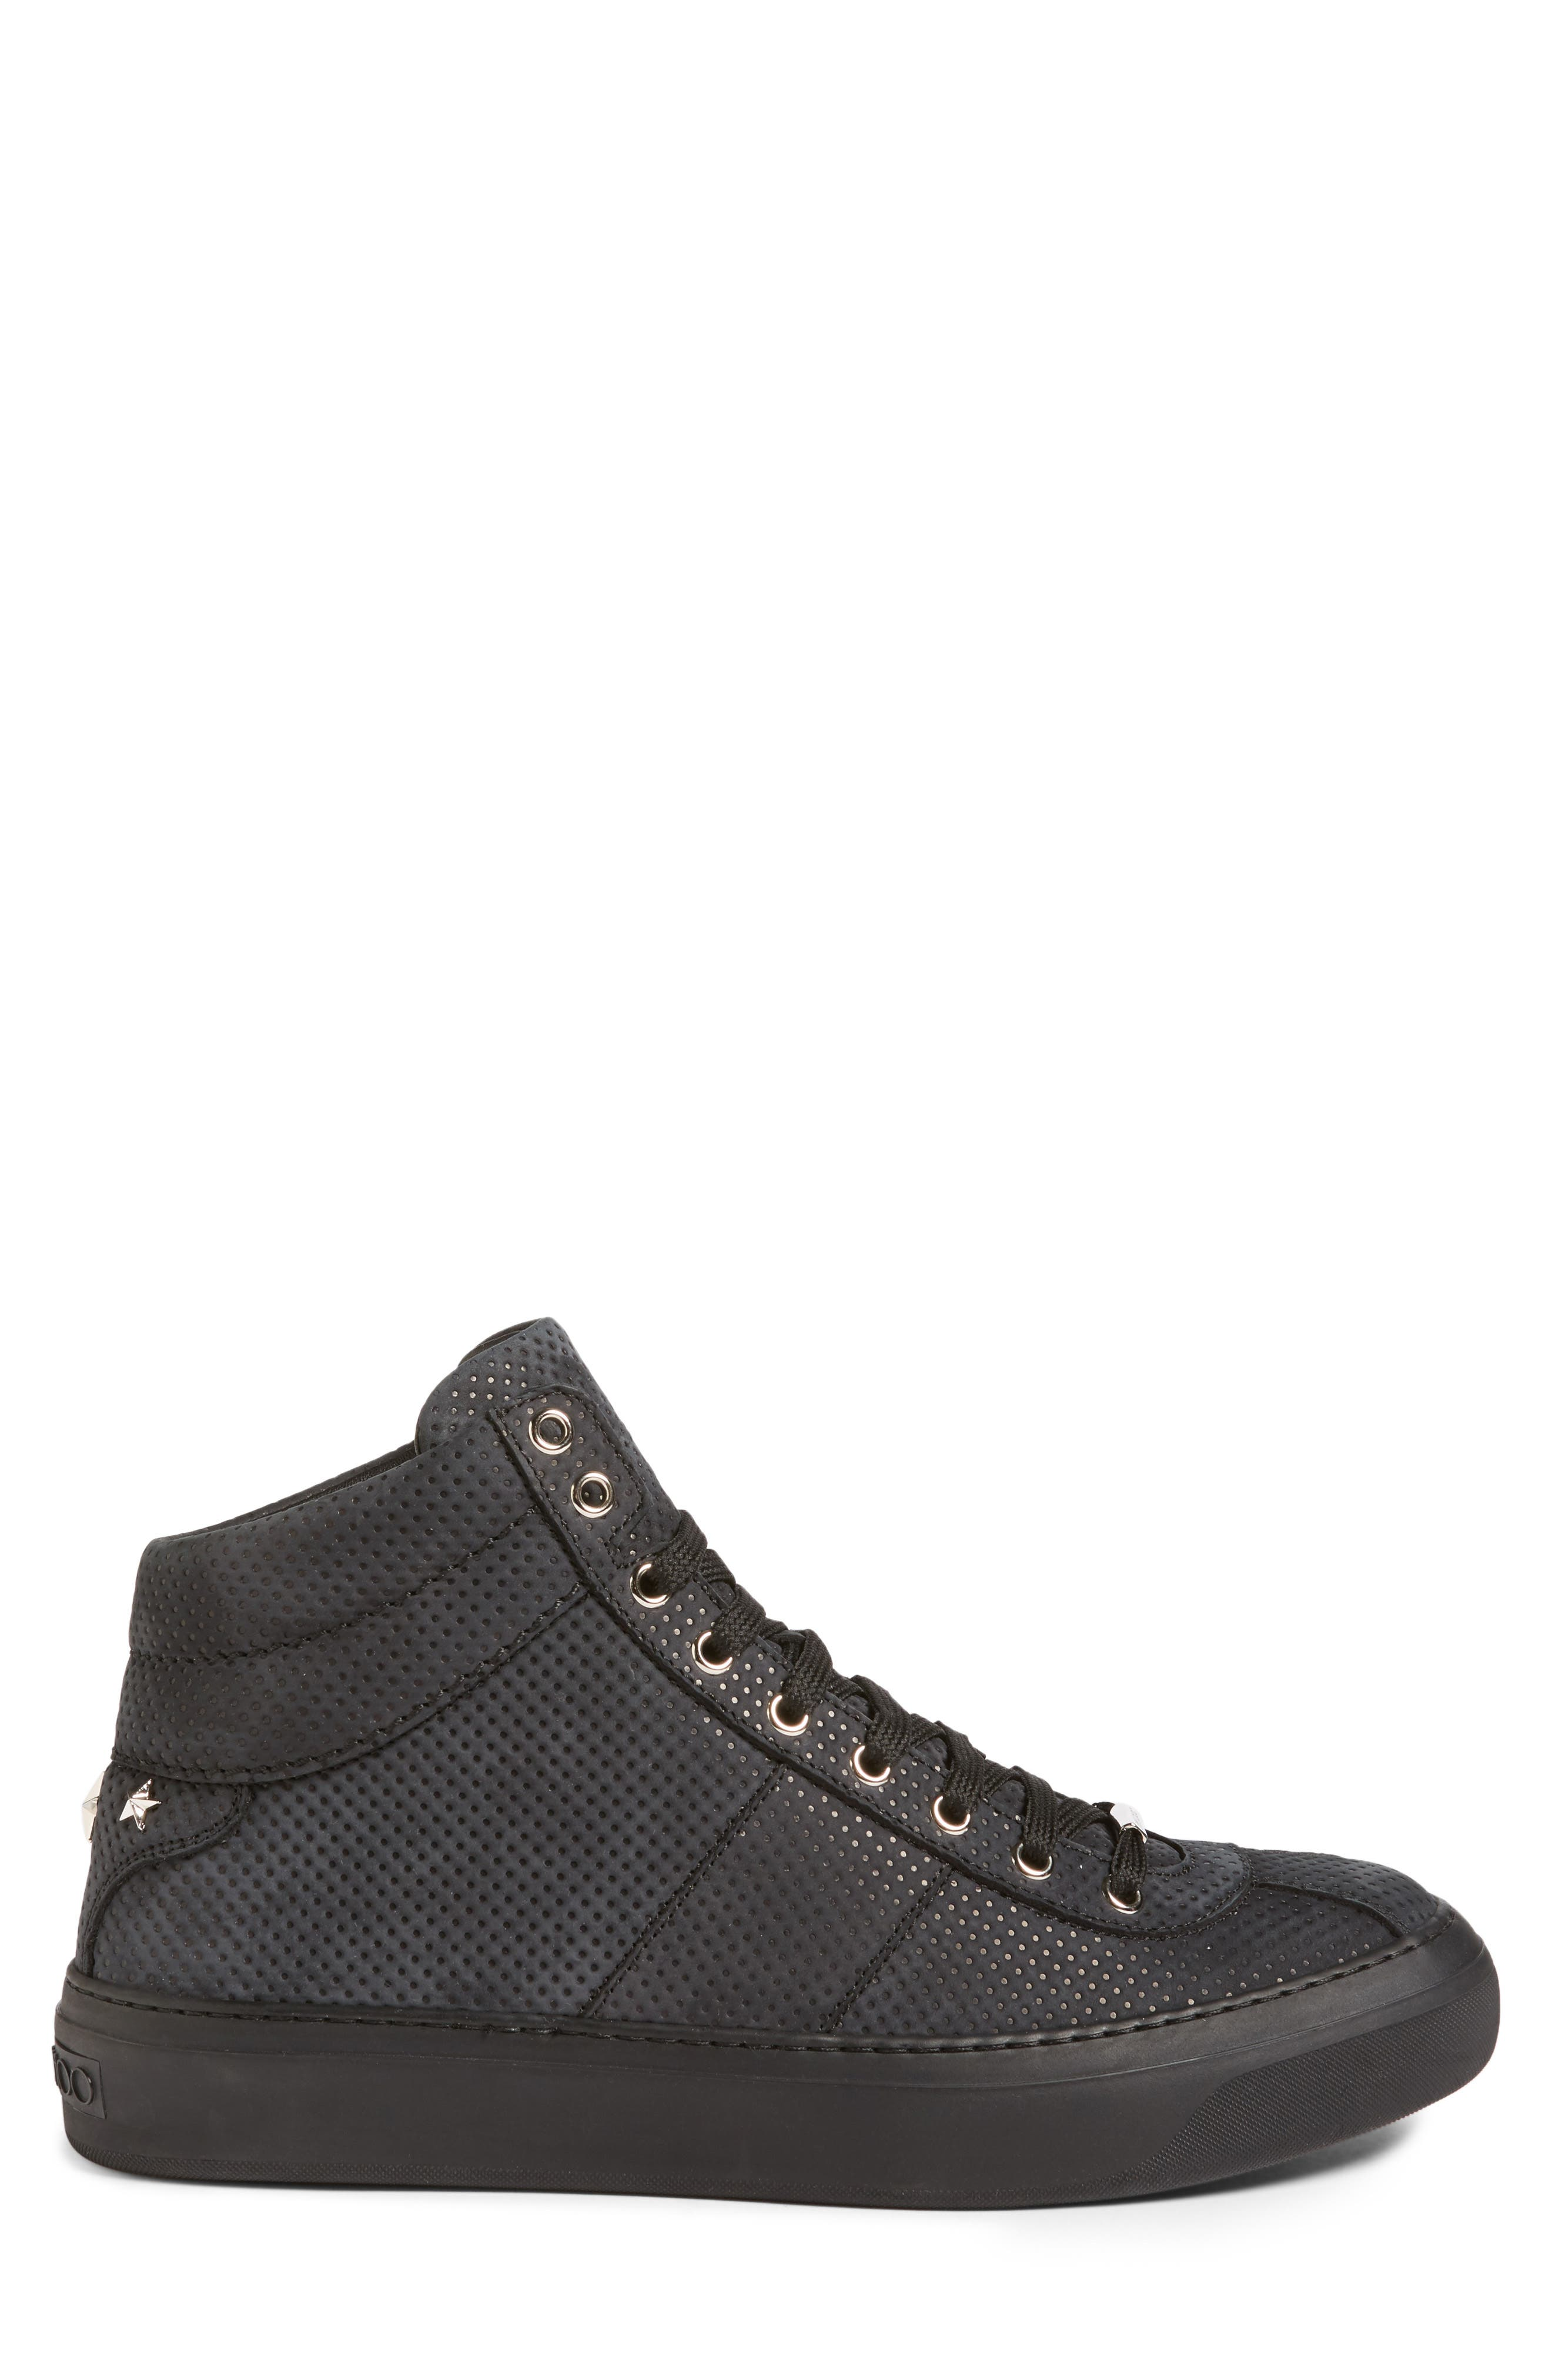 Belgravi Sneaker,                             Alternate thumbnail 3, color,                             Black/ Steel